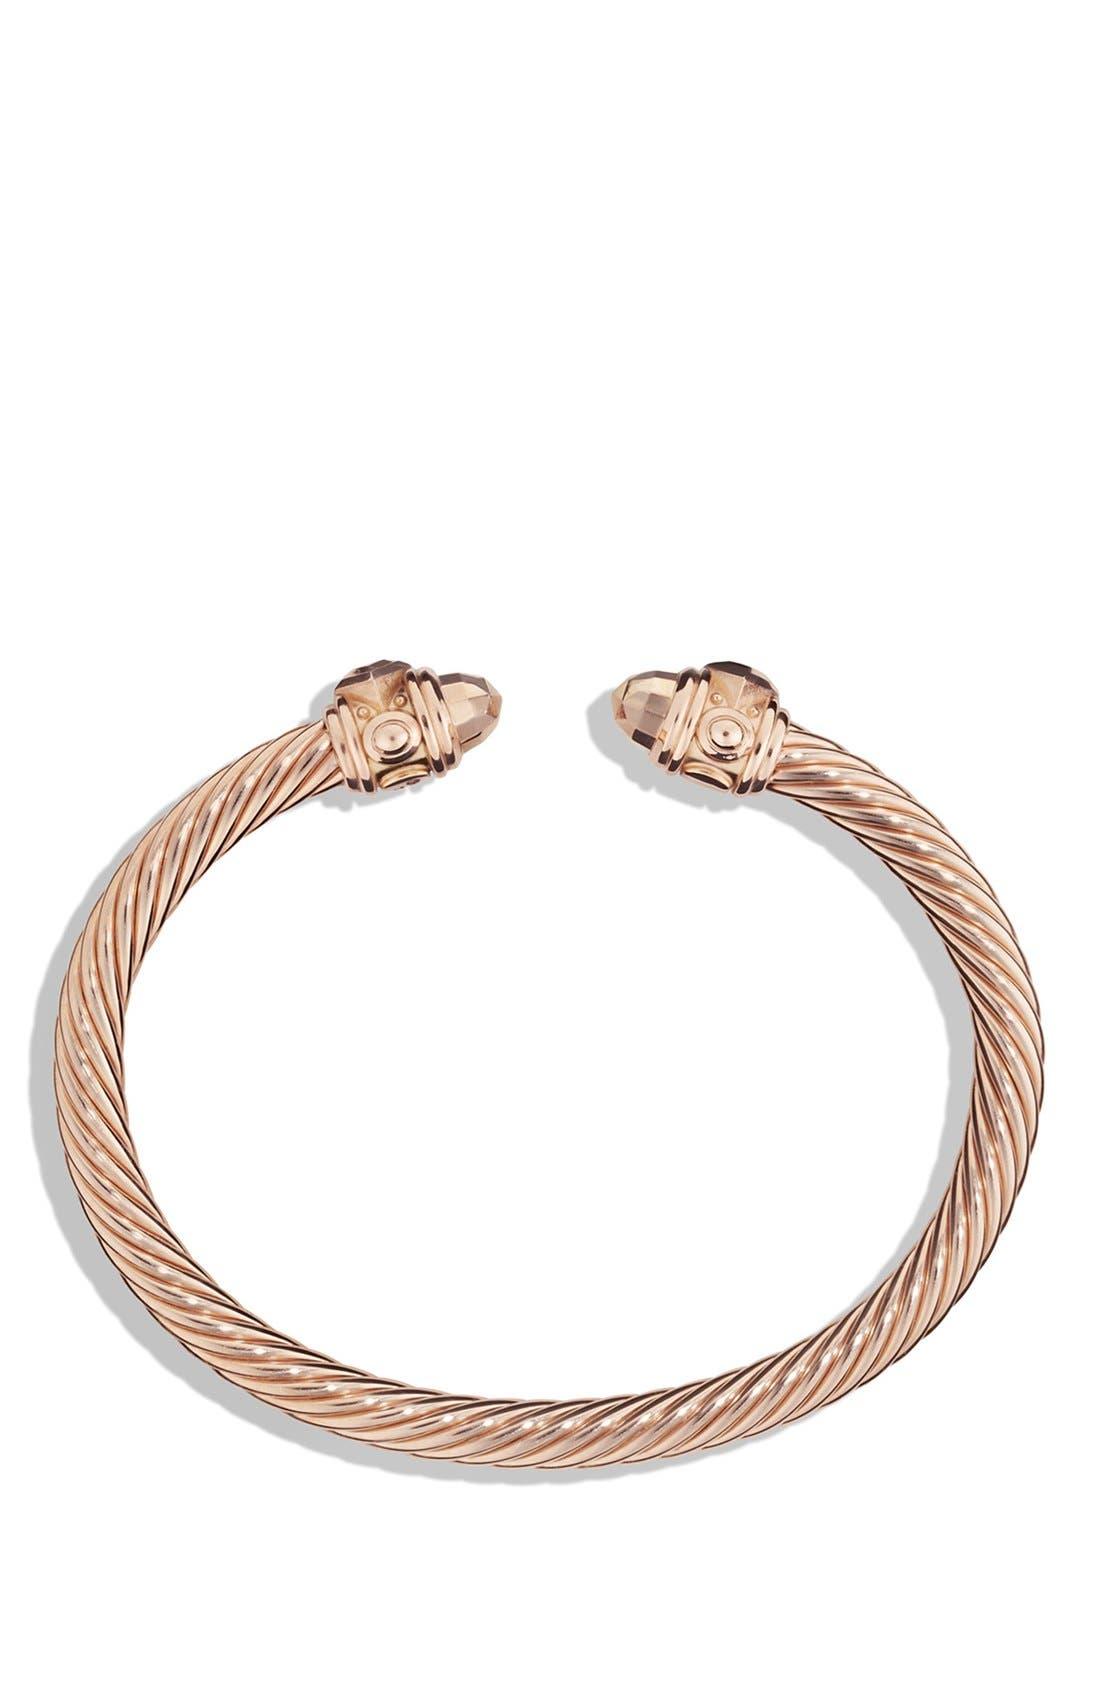 Renaissance Bracelet in 18K Rose Gold, 5mm,                             Alternate thumbnail 4, color,                             ROSE GOLD